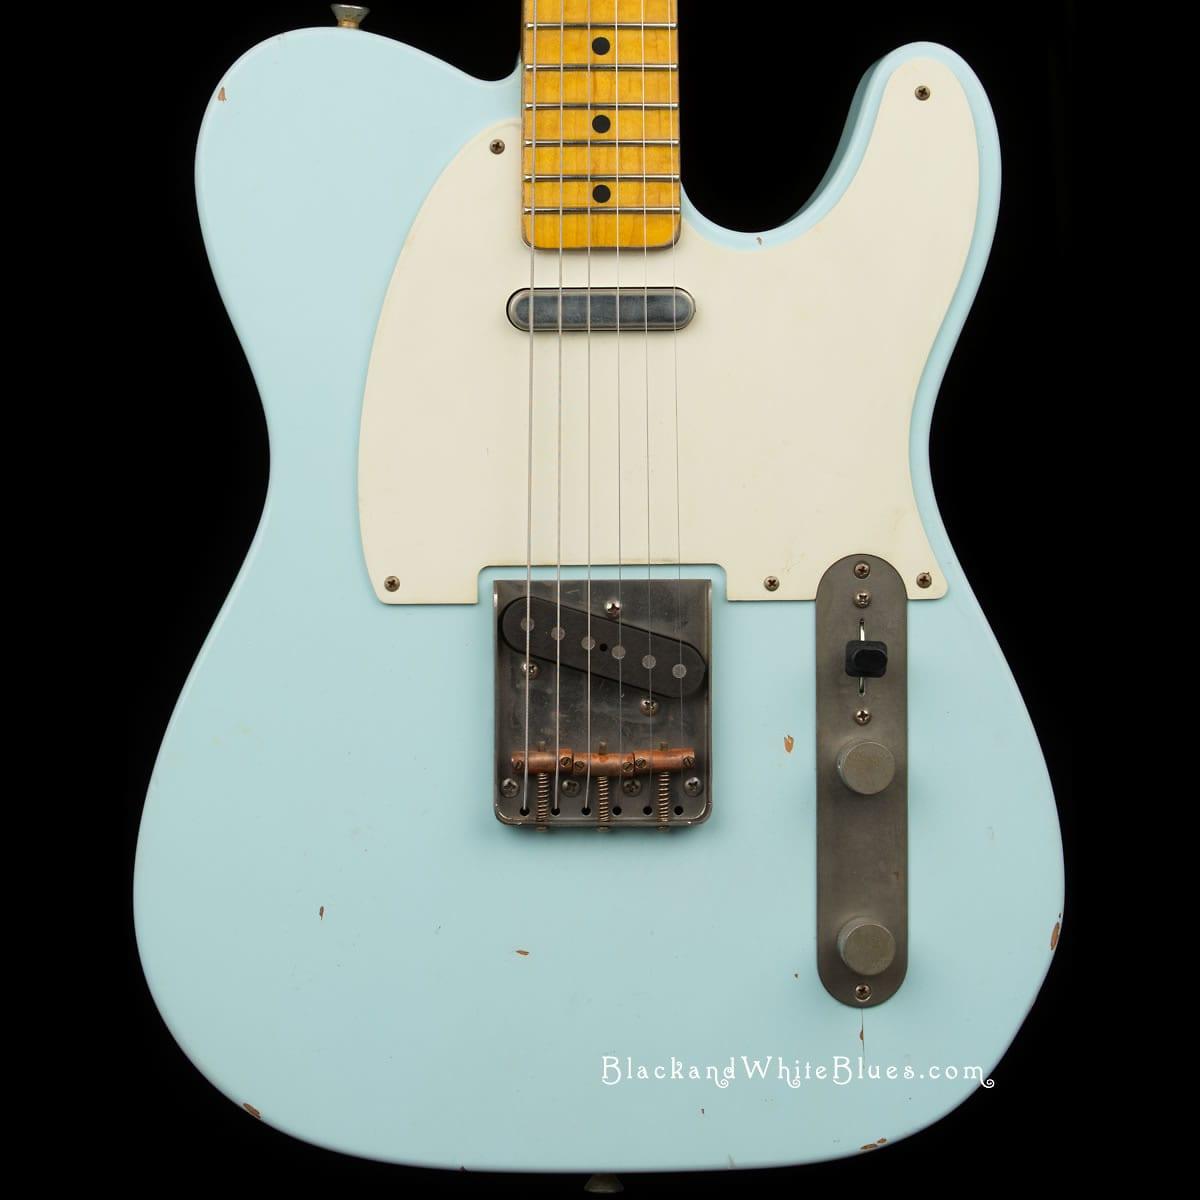 Nash Guitars T-63 Light Distress in Sonic Blue